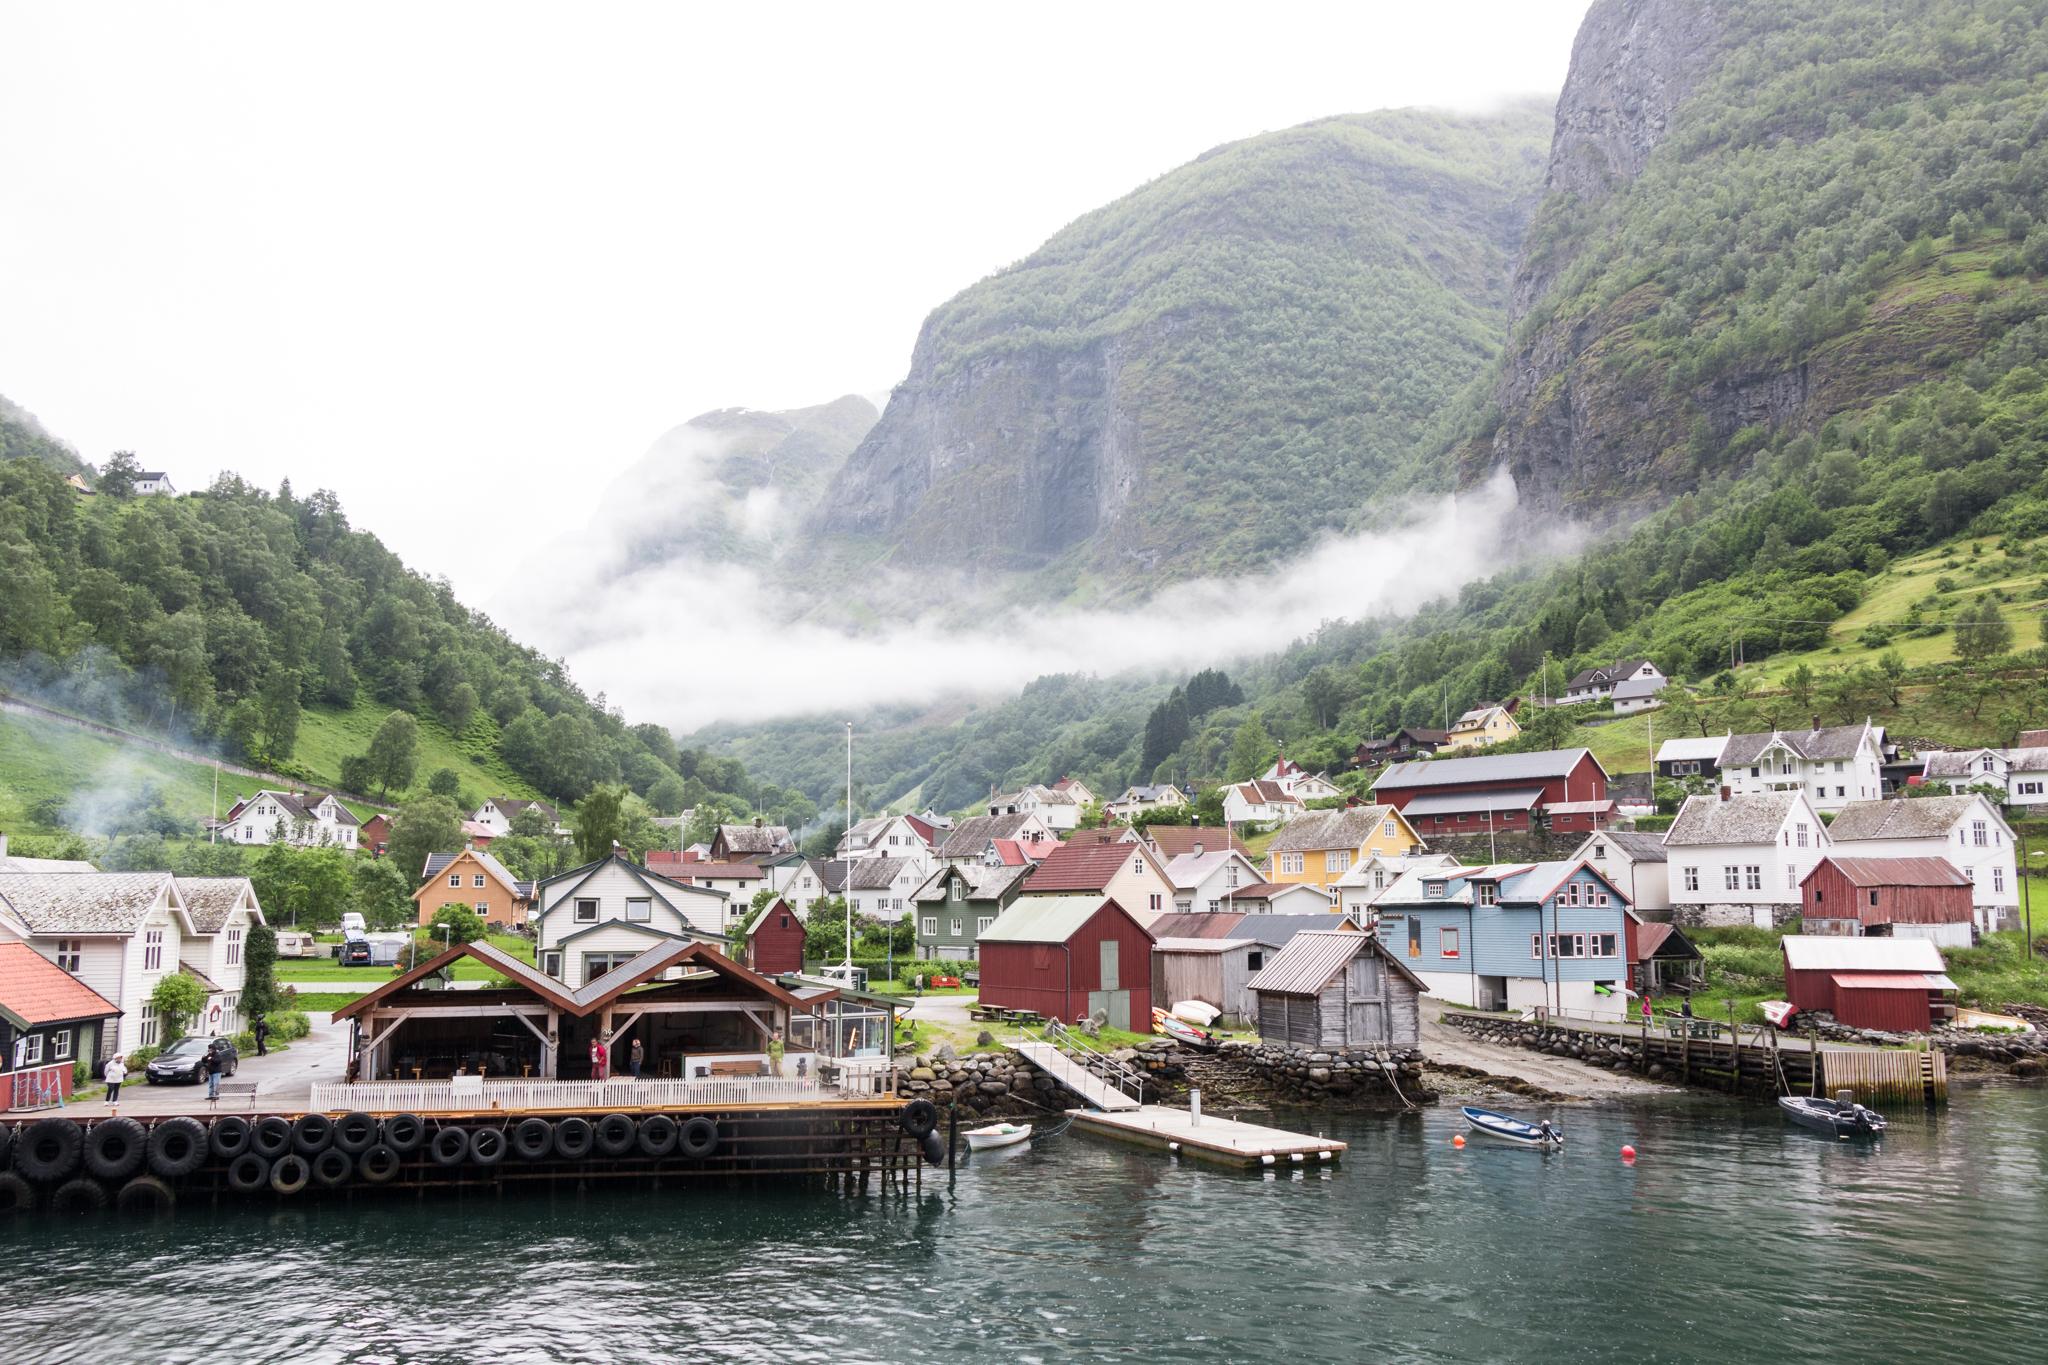 Ferry over Nærøyfjord and Aurlandsfjord to Flåm, Norway